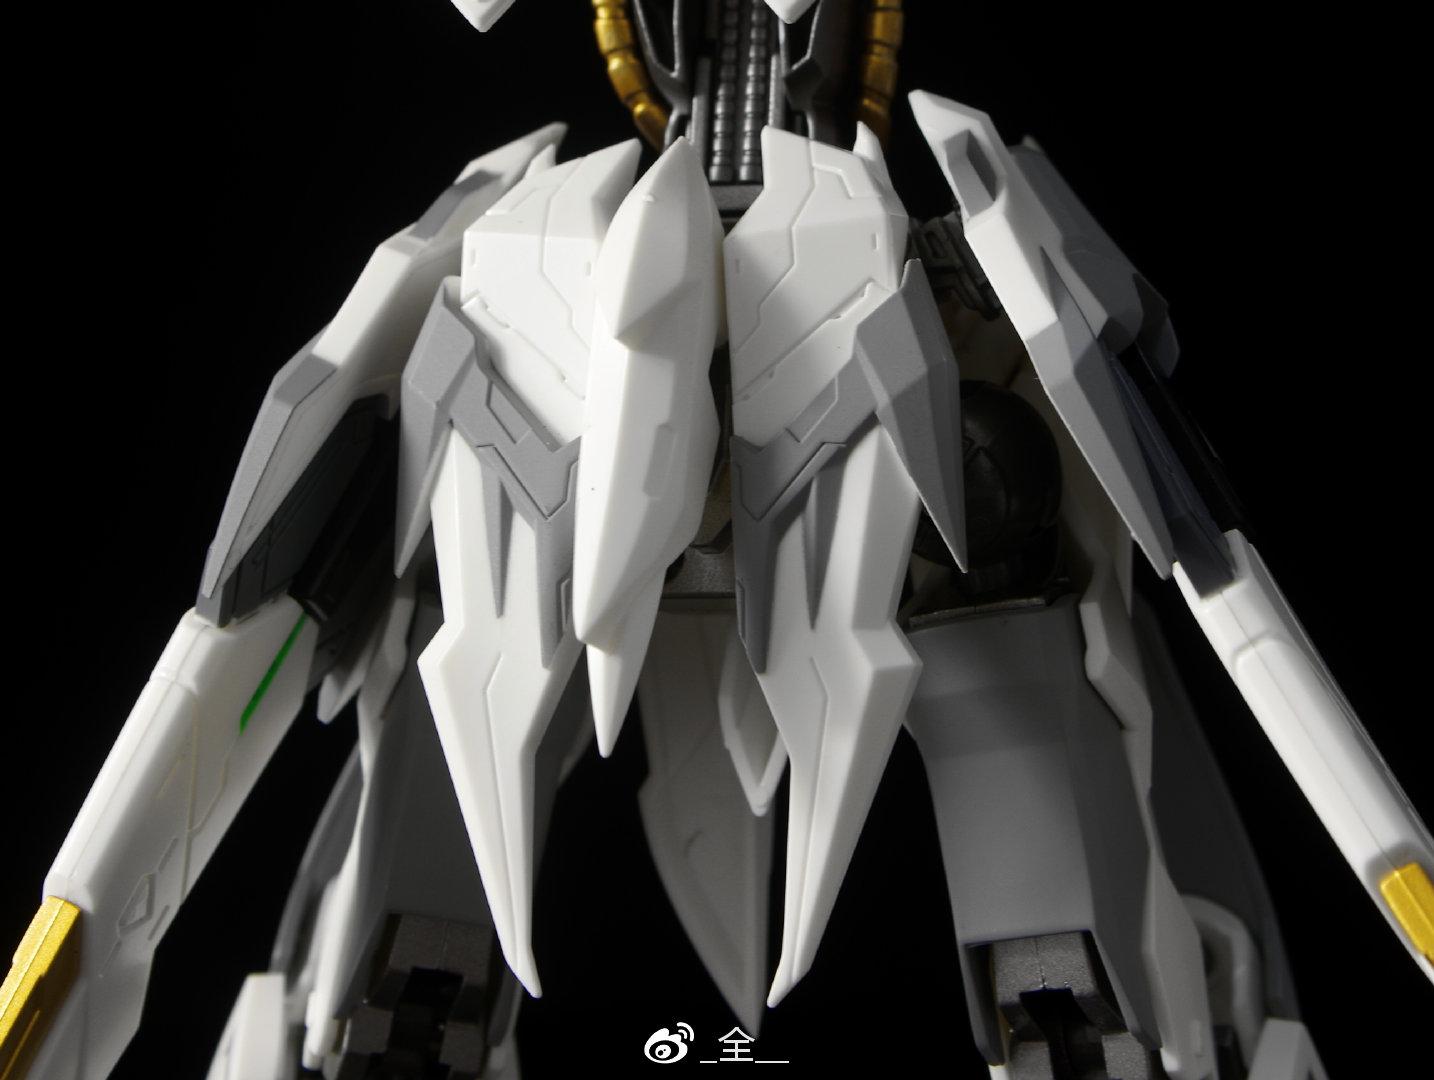 S279_MetalMyth_ryuou_inask_026.jpg